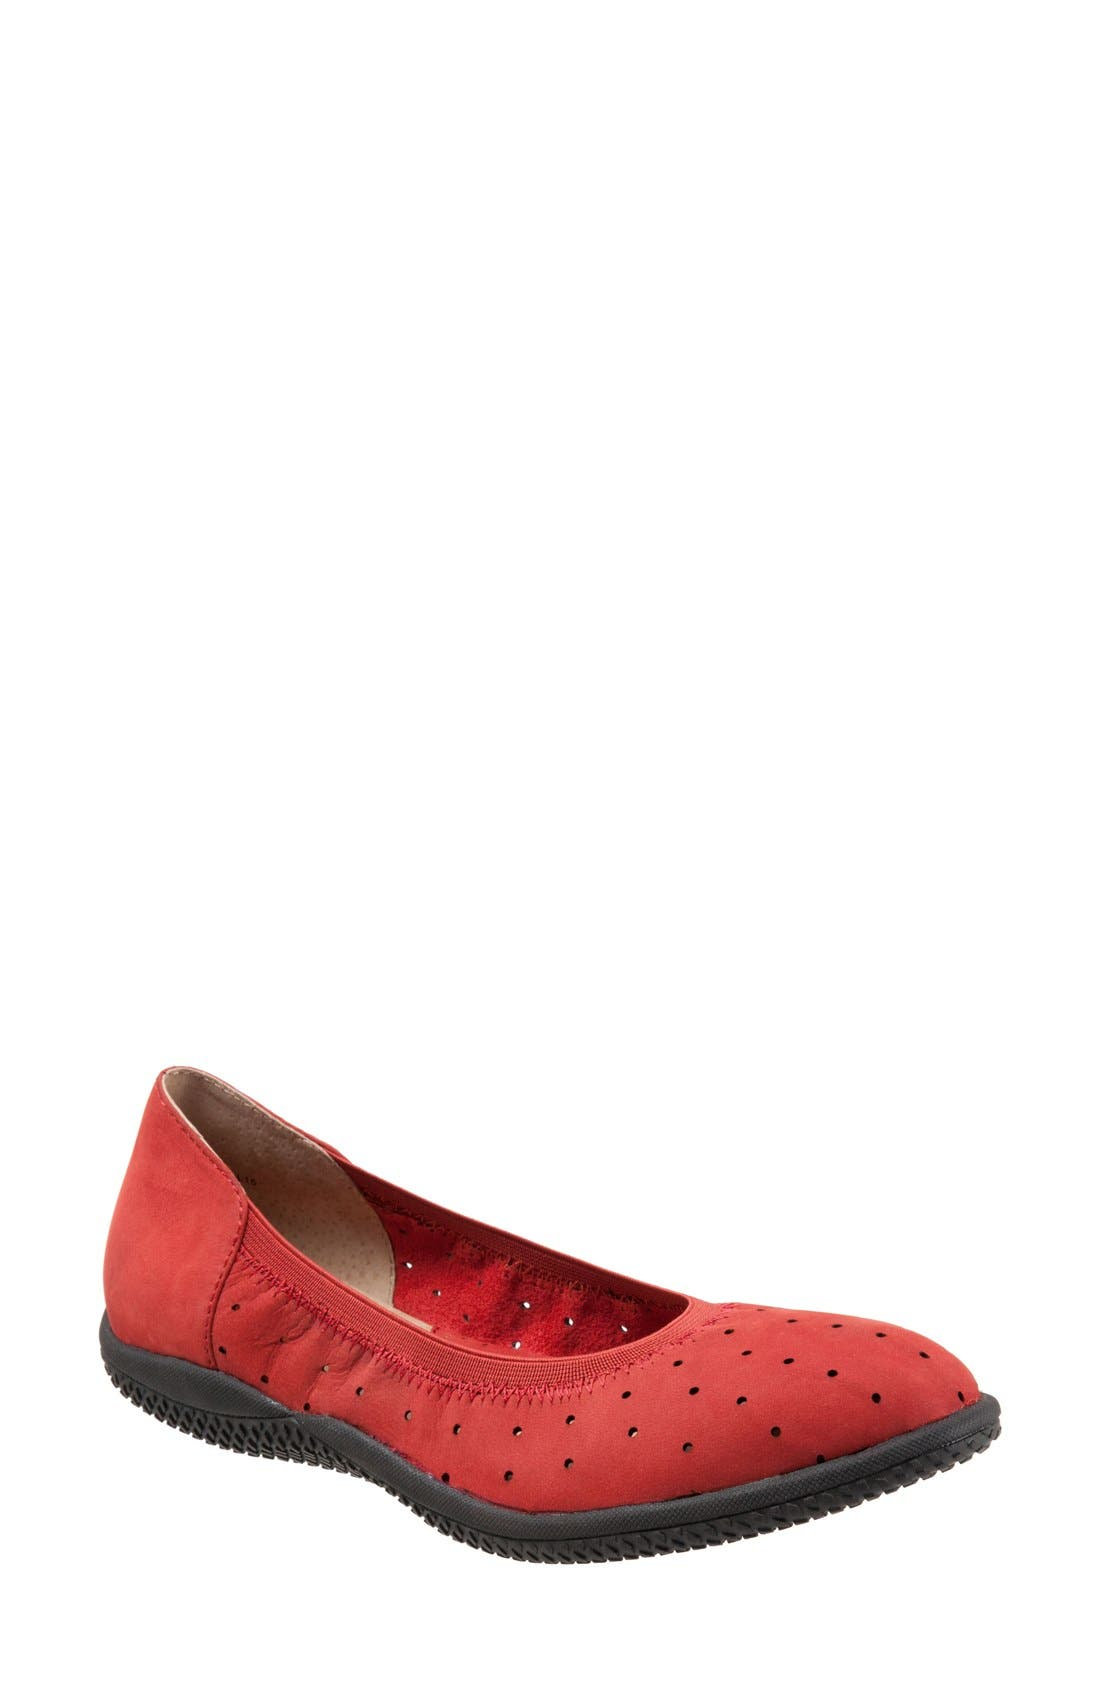 Alternate Image 1 Selected - SoftWalk® 'Hampshire' Dot Perforated Ballet Flat (Women)